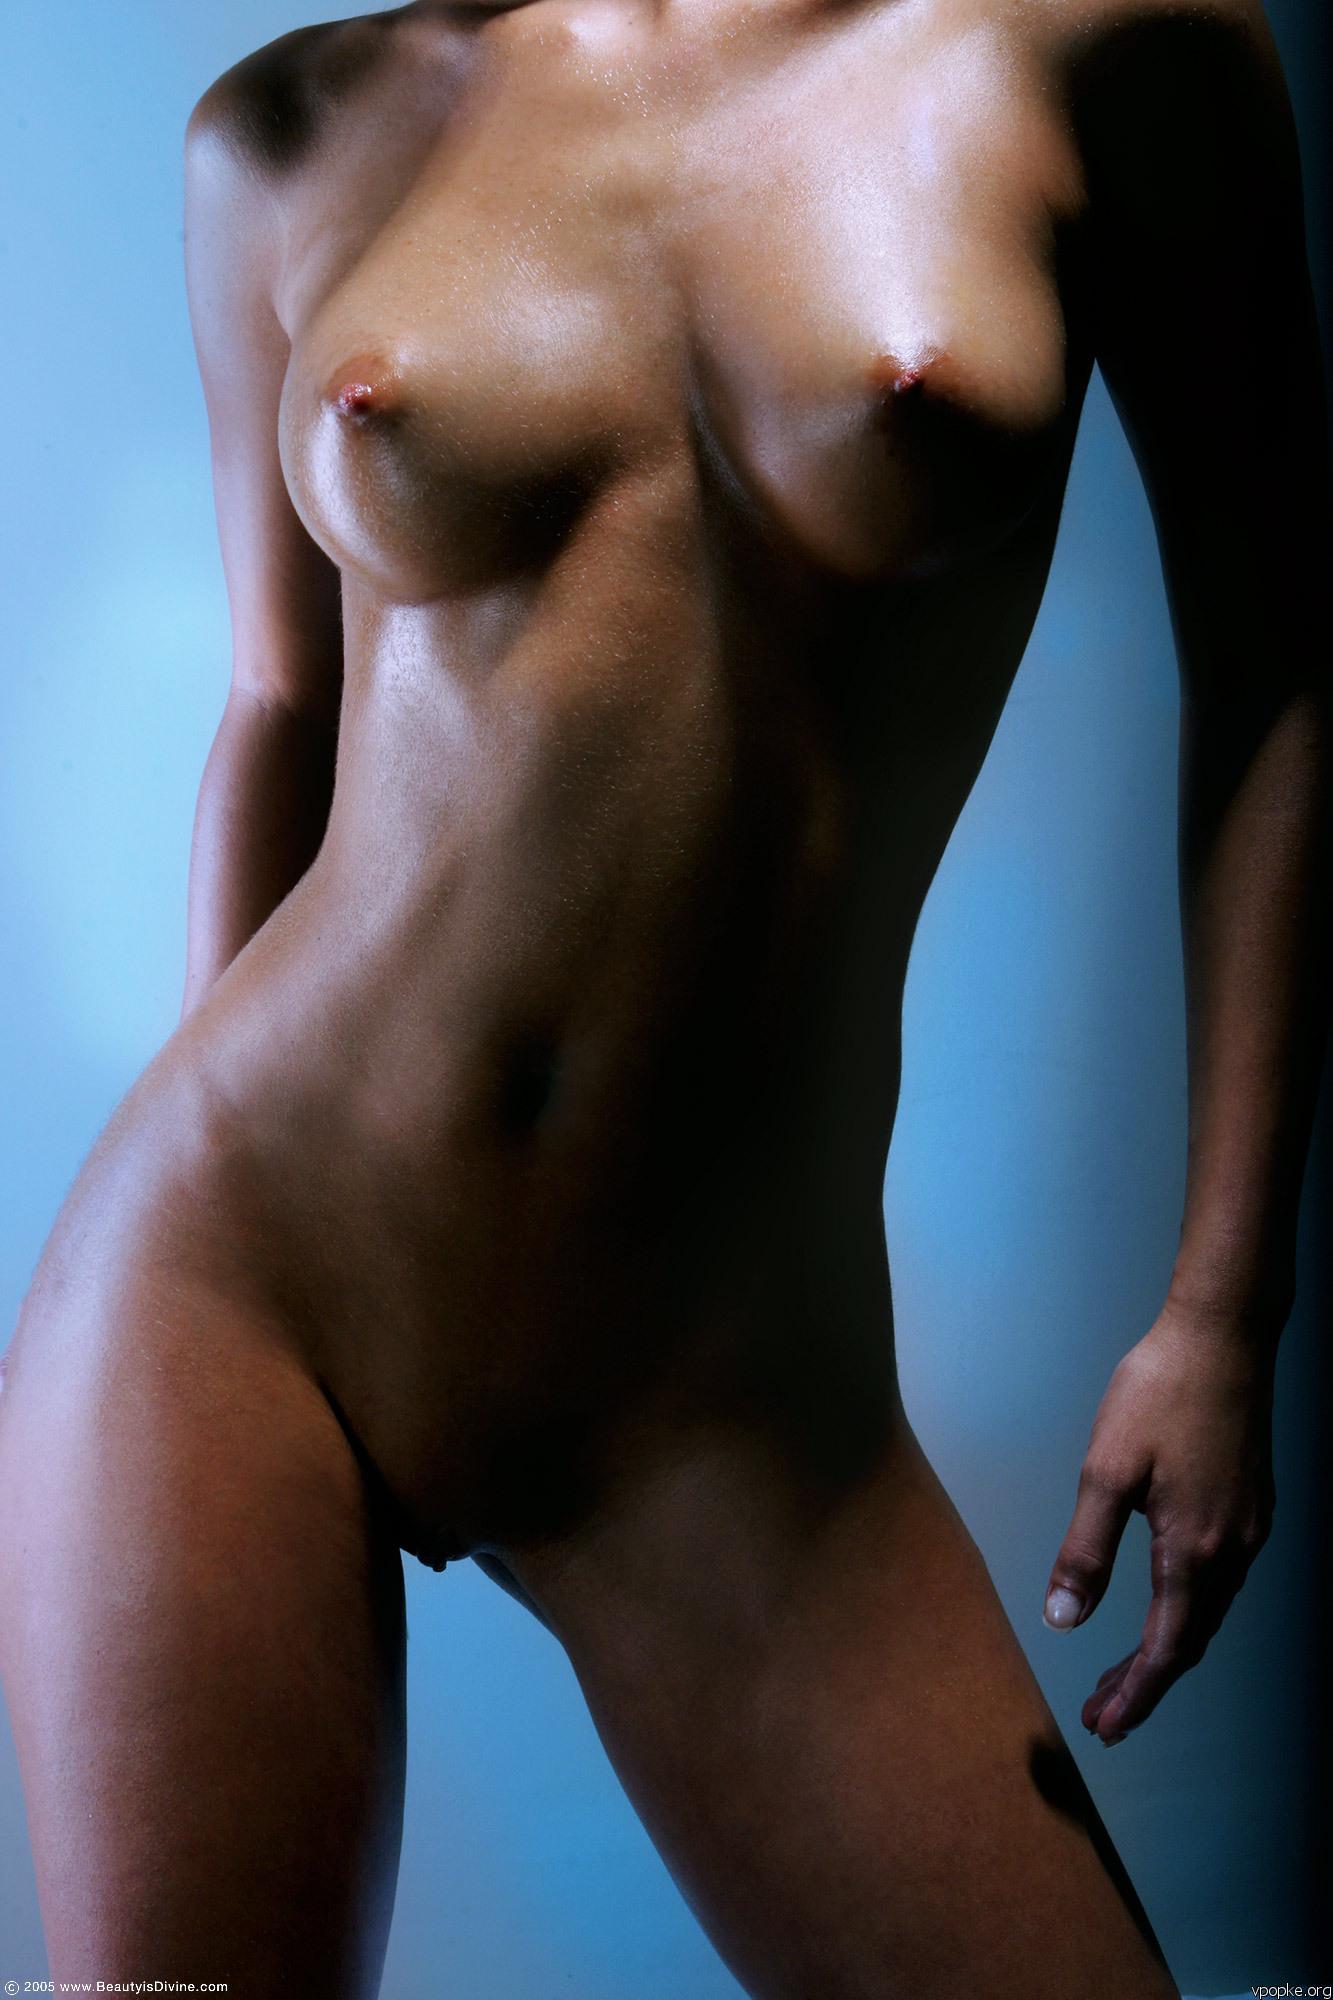 seks-krasivie-figuri-zhenshin